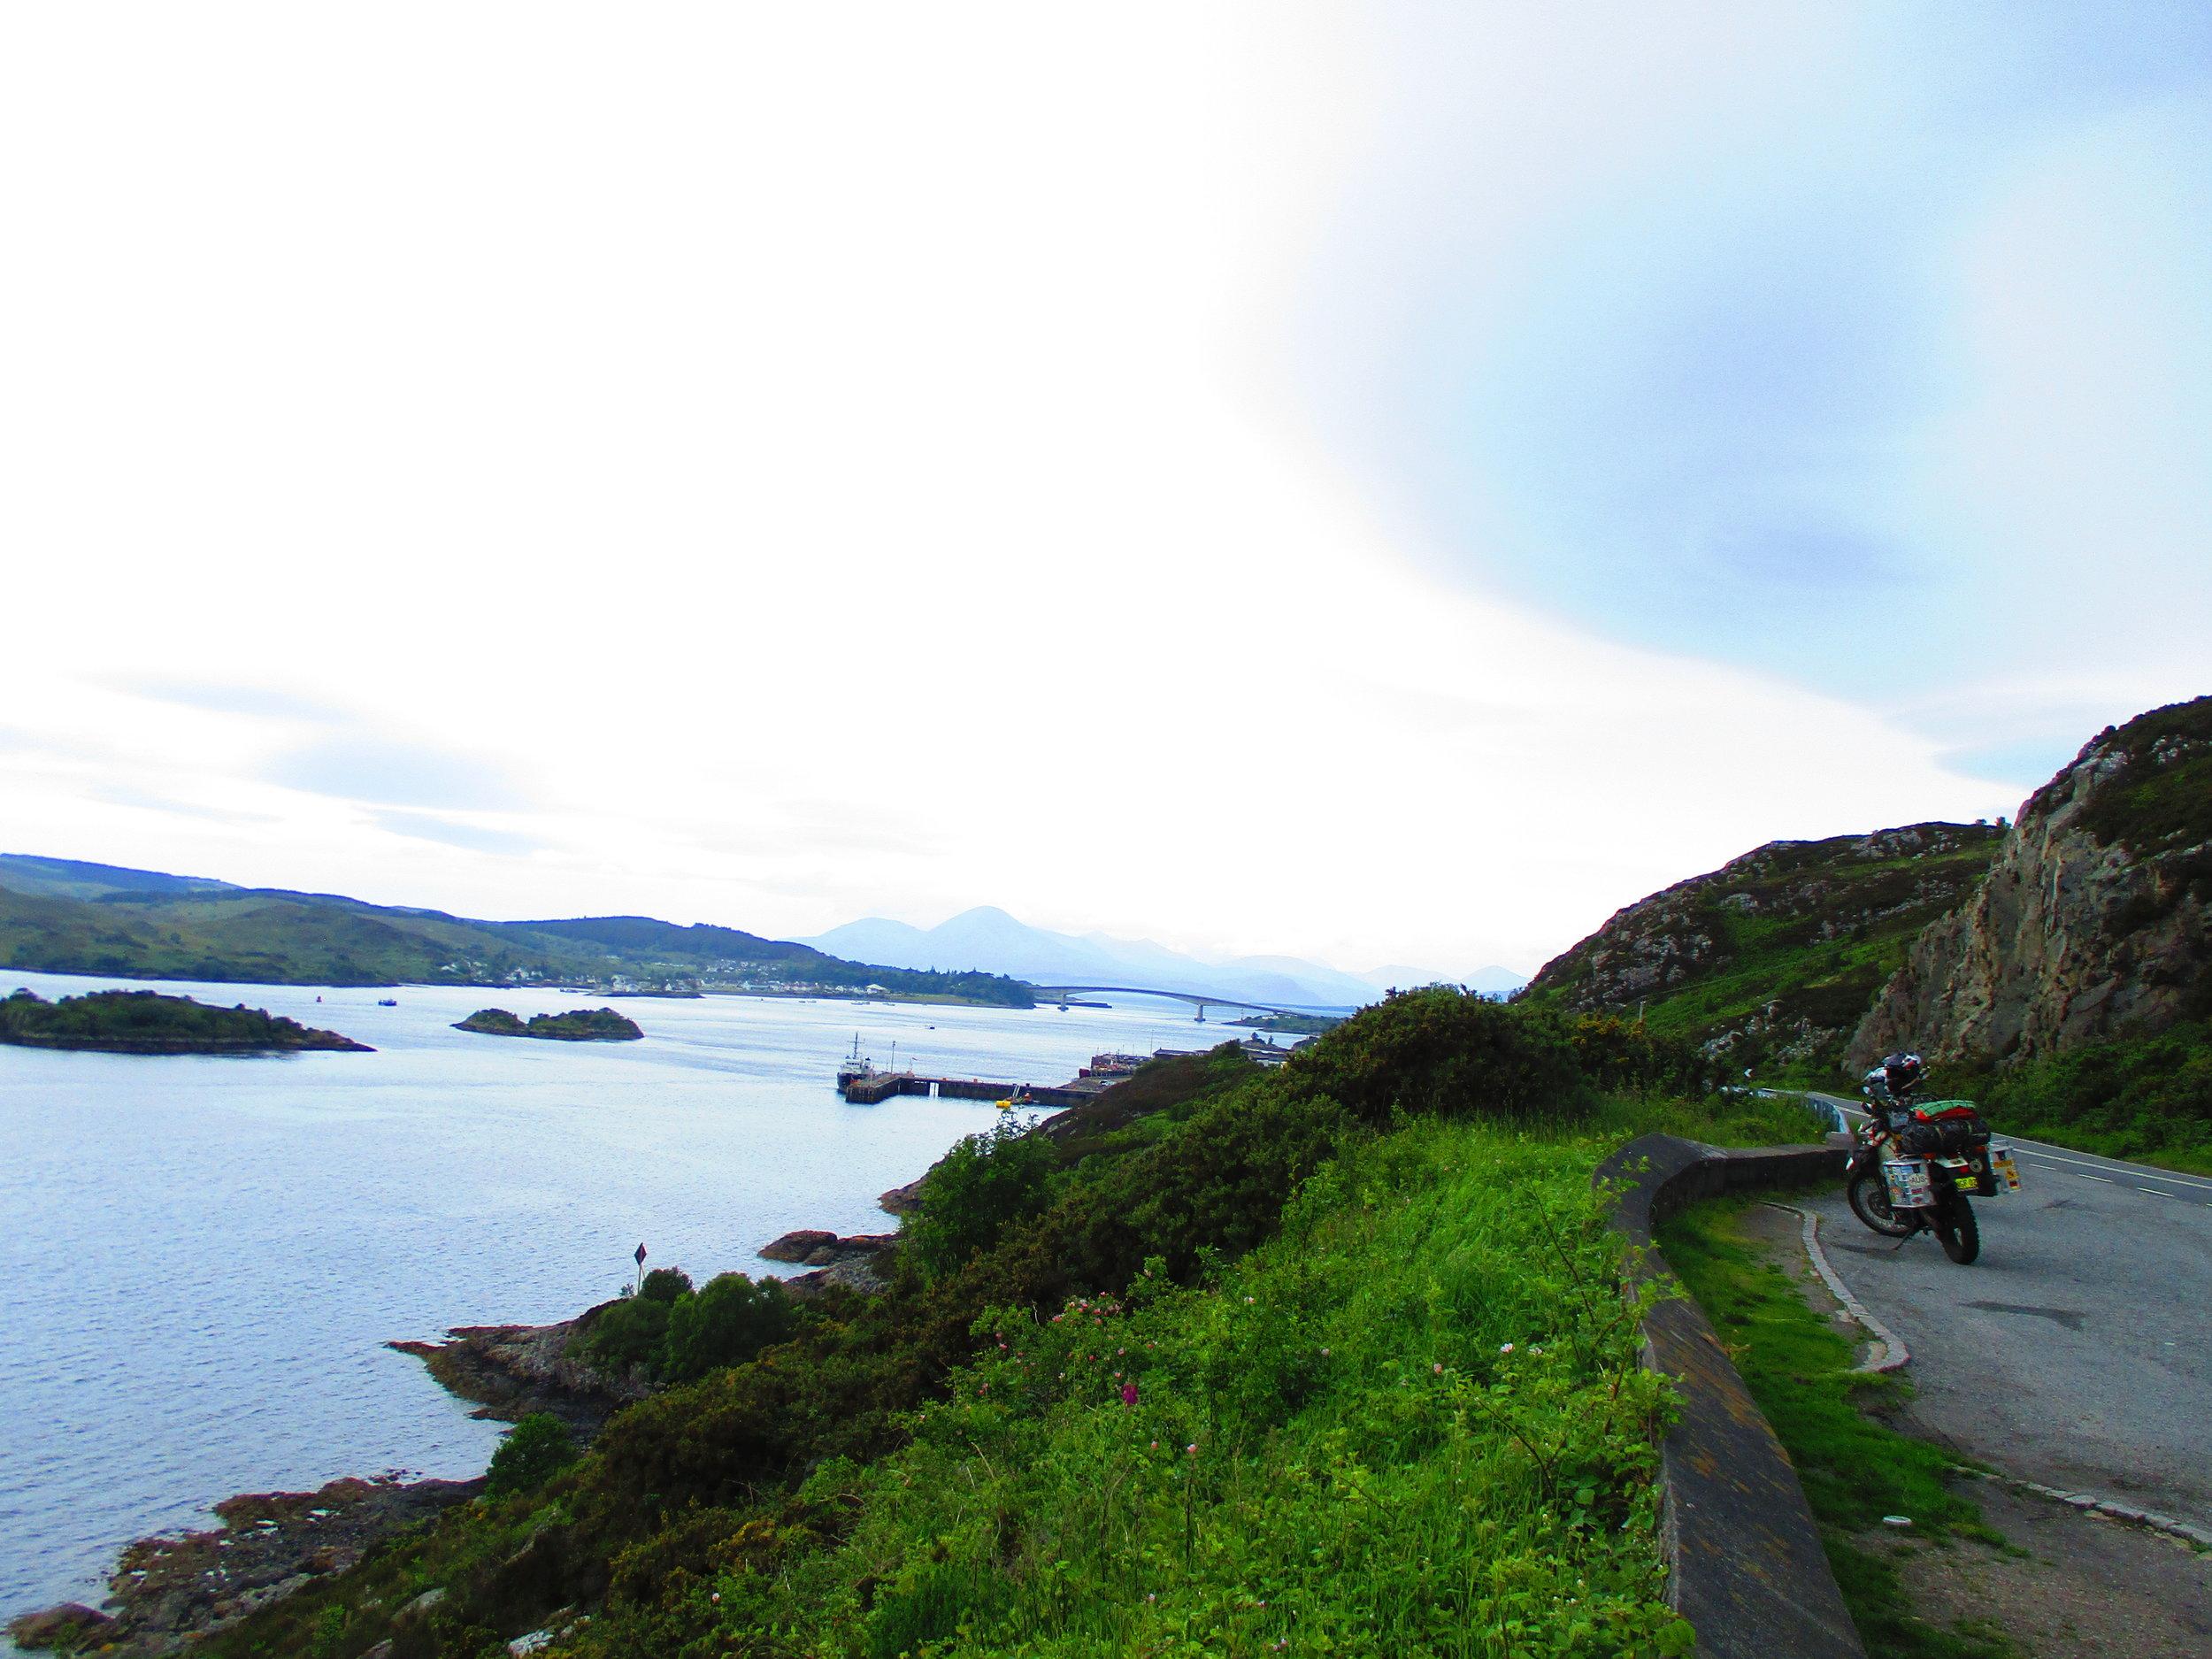 The bridge to the Isle of Skye